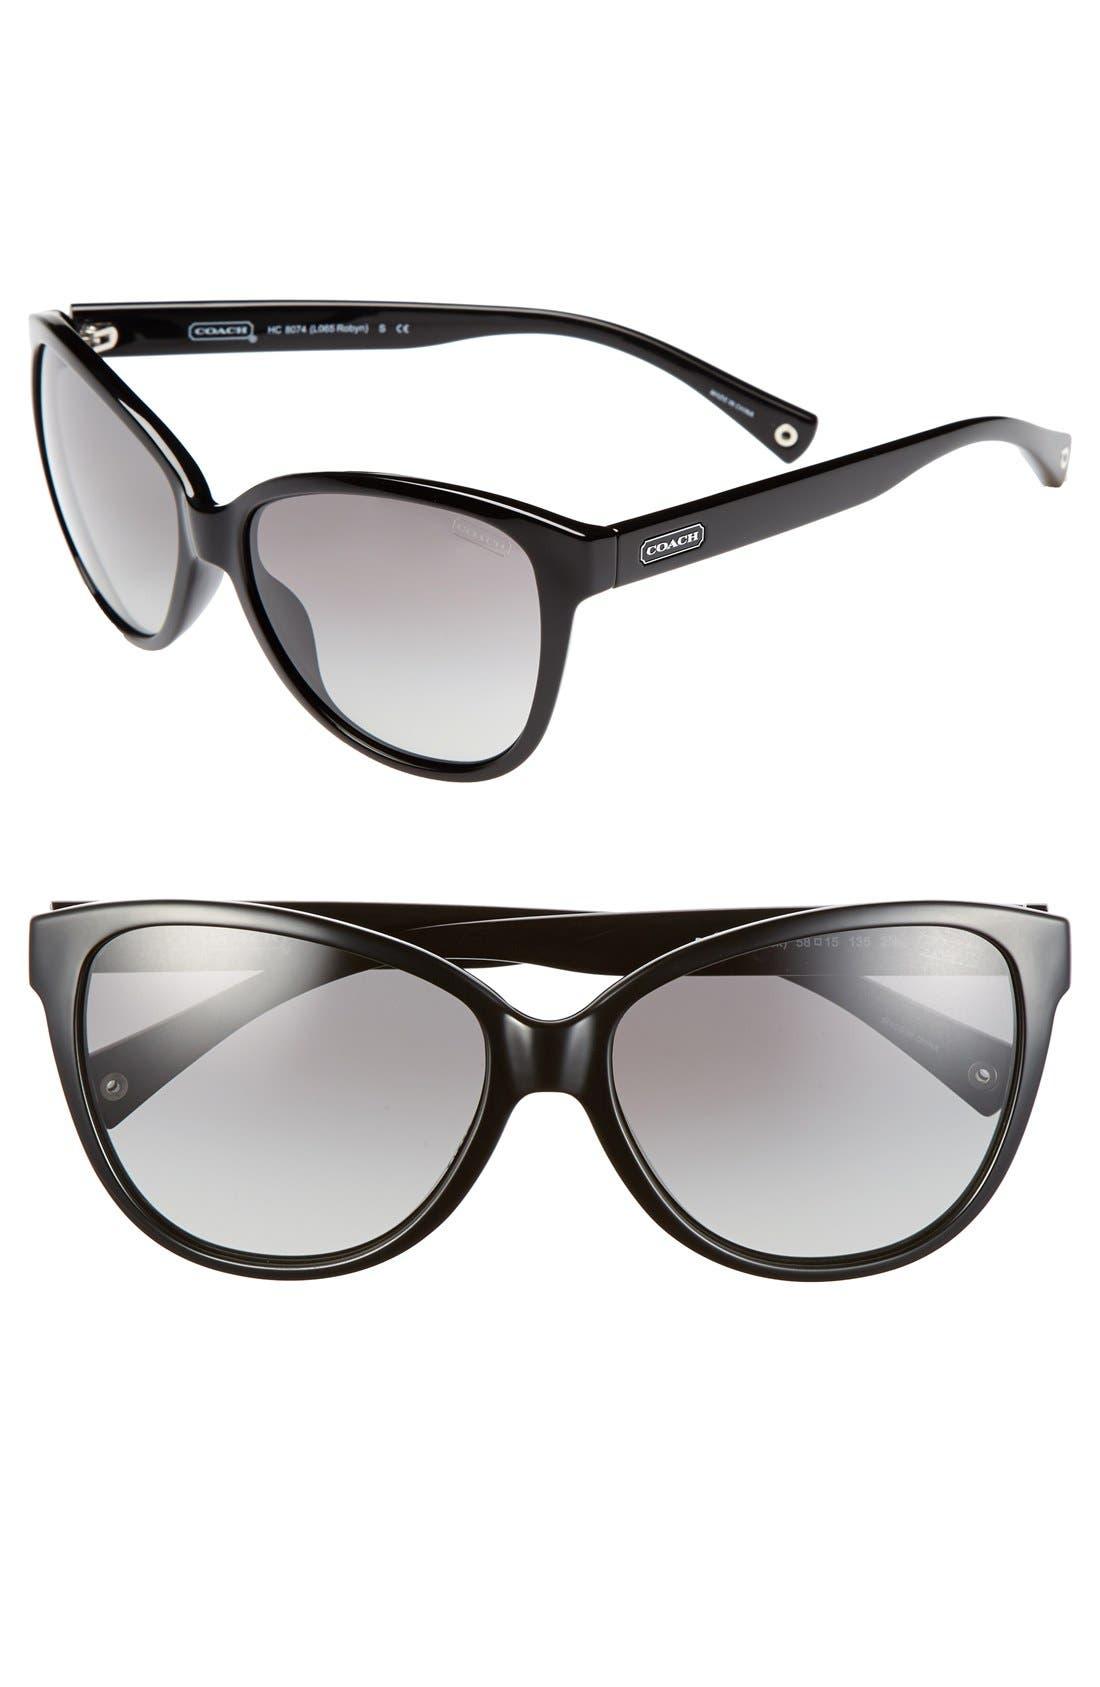 Main Image - COACH 58mm Cat Eye Sunglasses